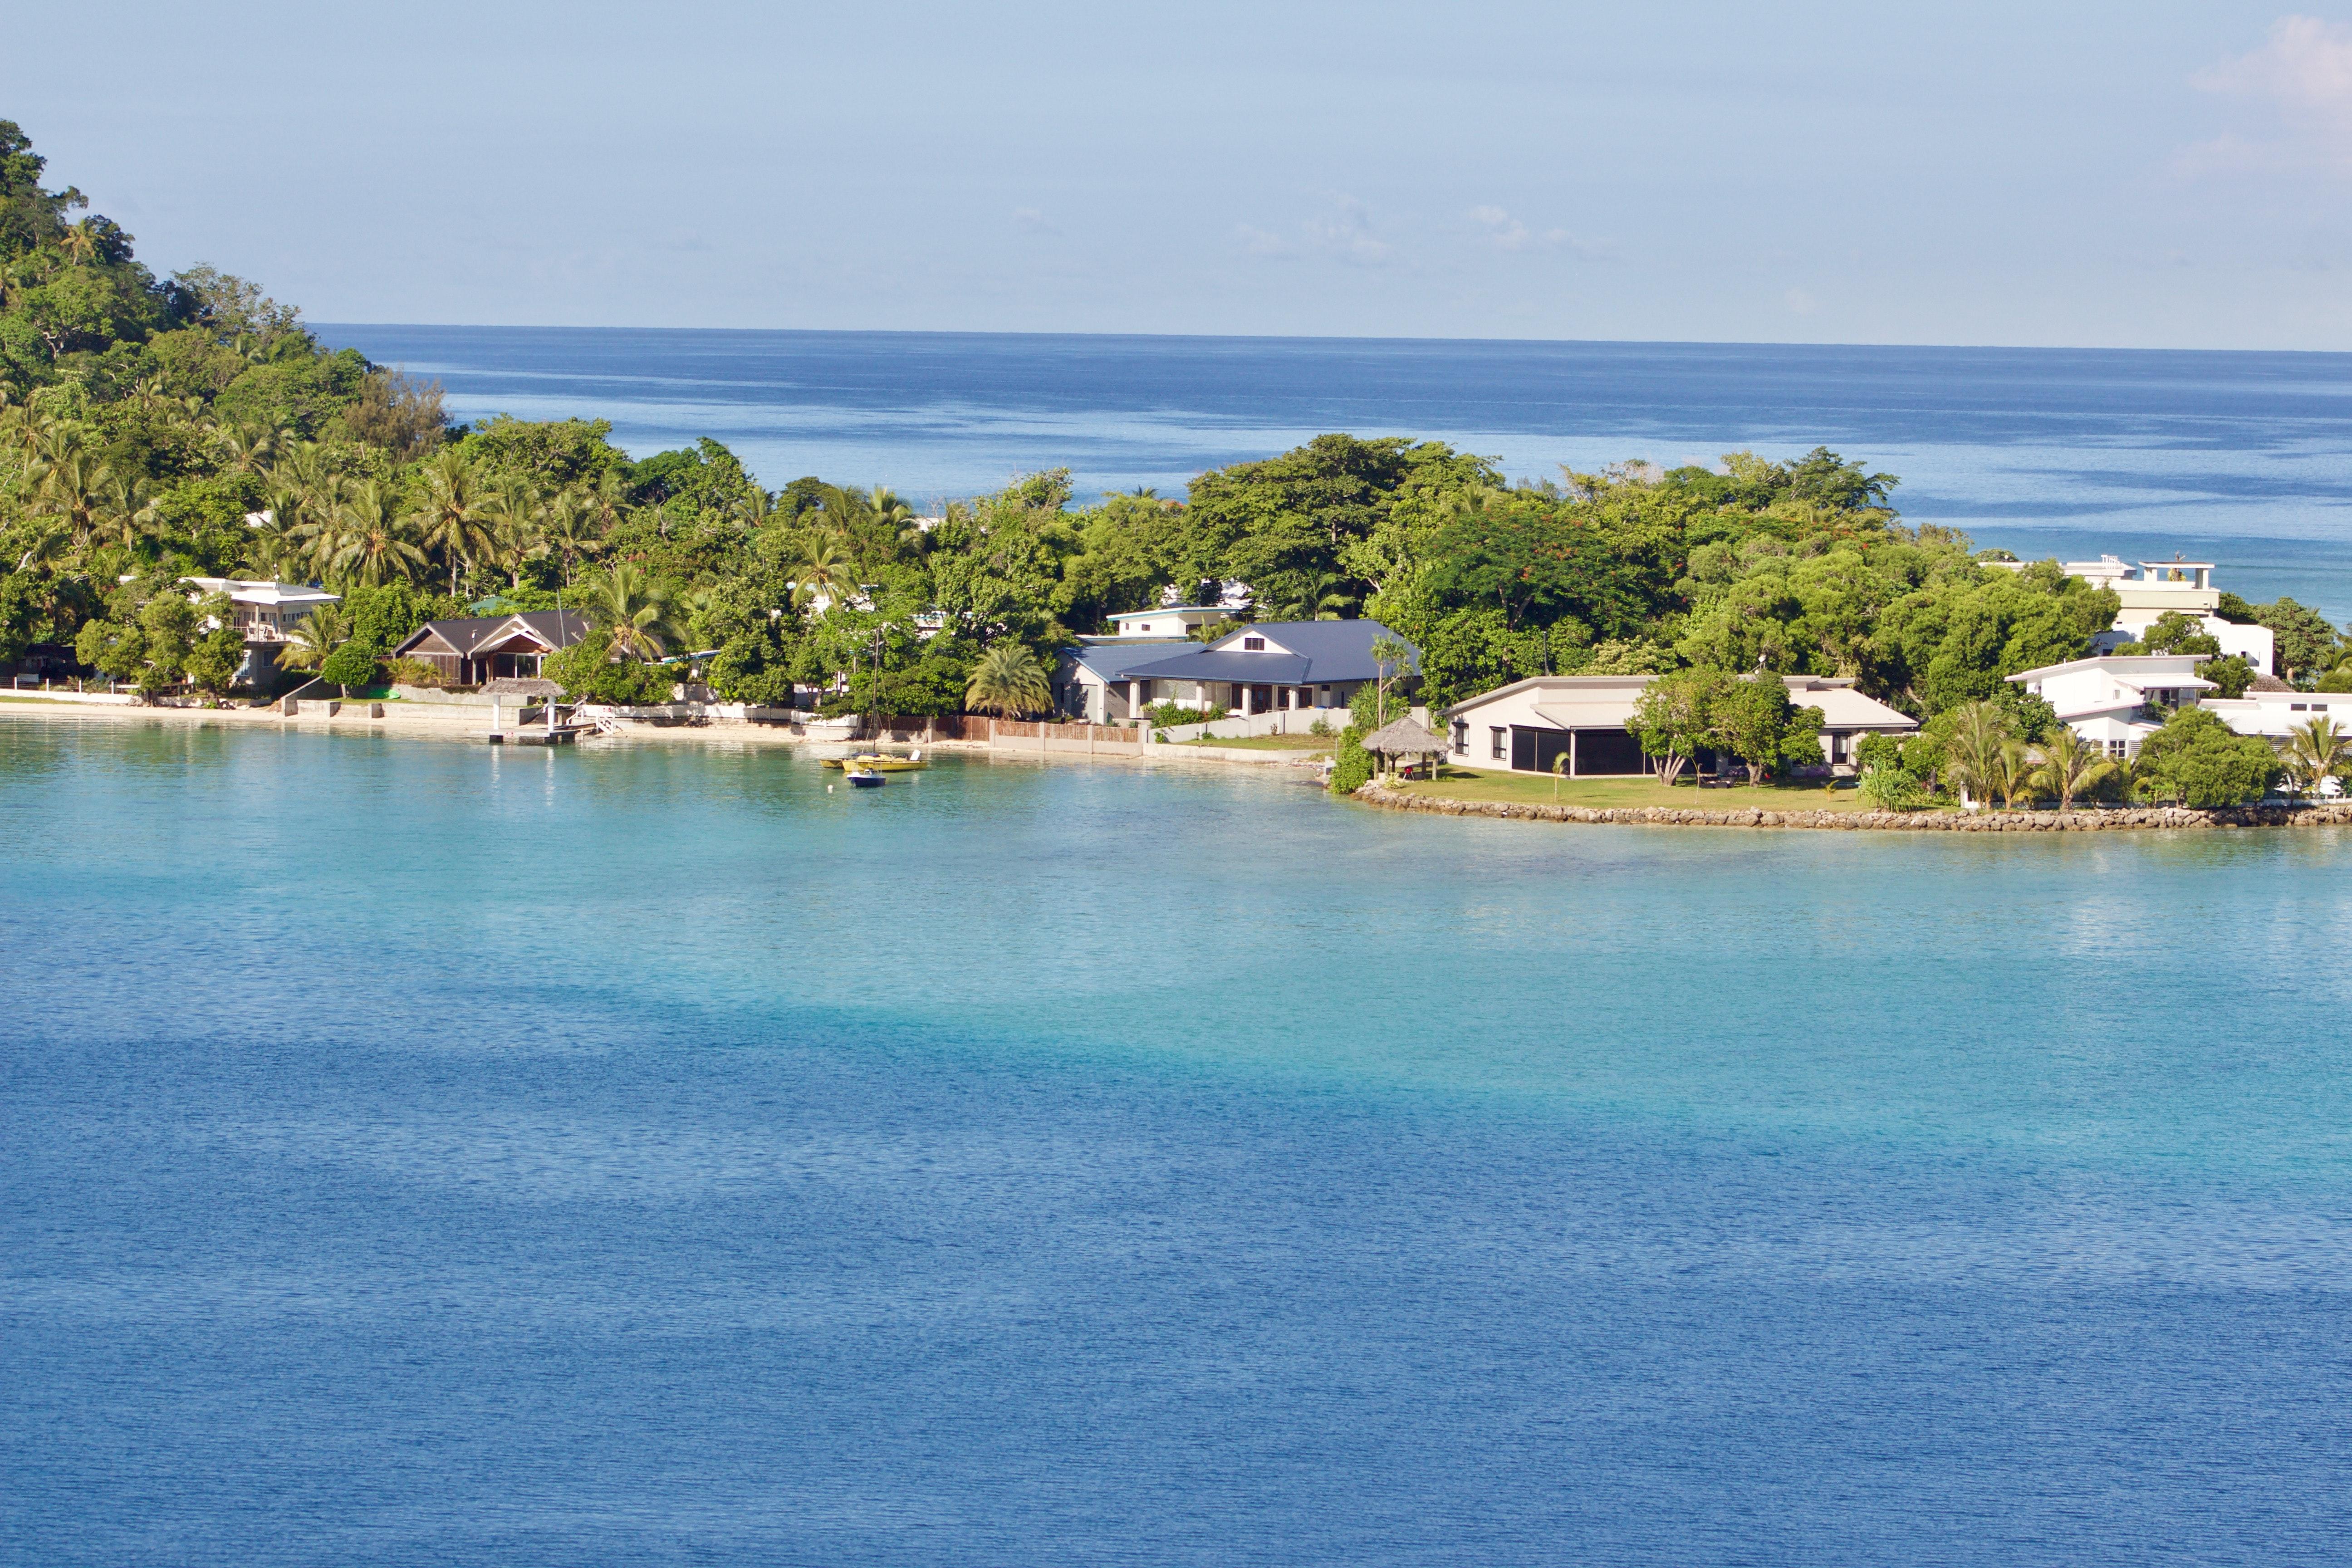 Beach Houses, Coast, Daylight, Houses, Island, HQ Photo